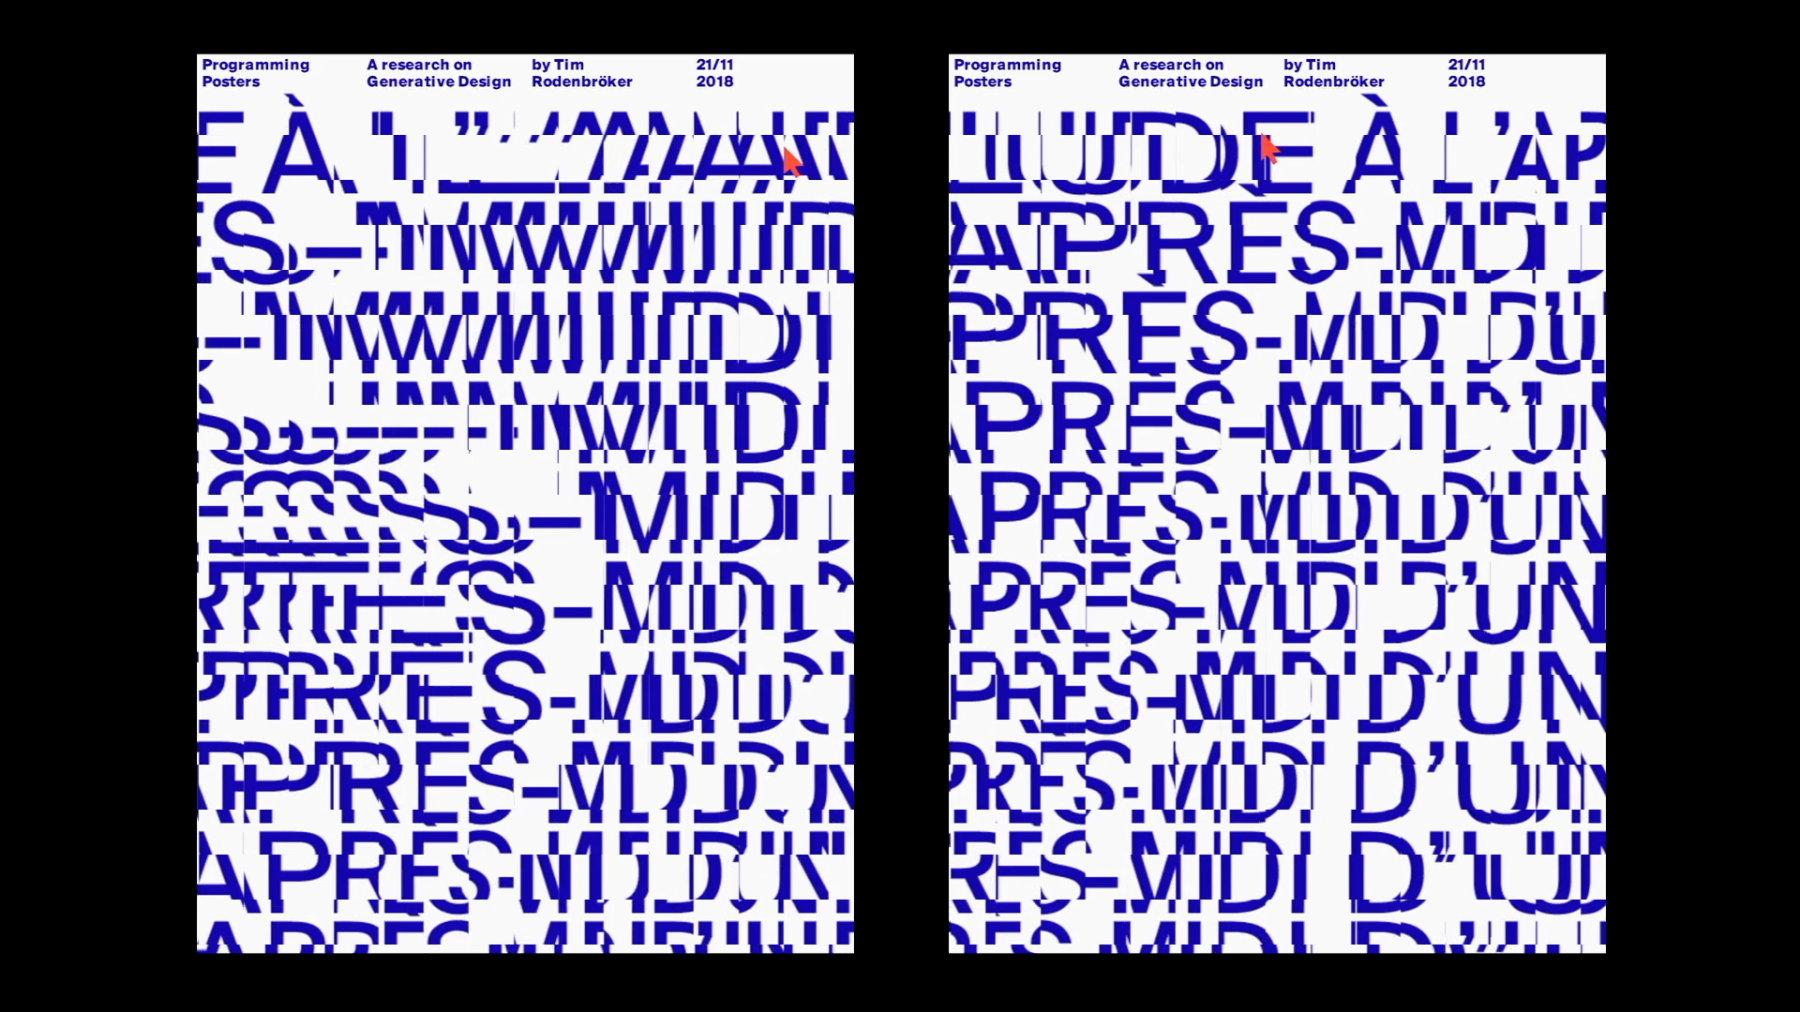 programmingposters05